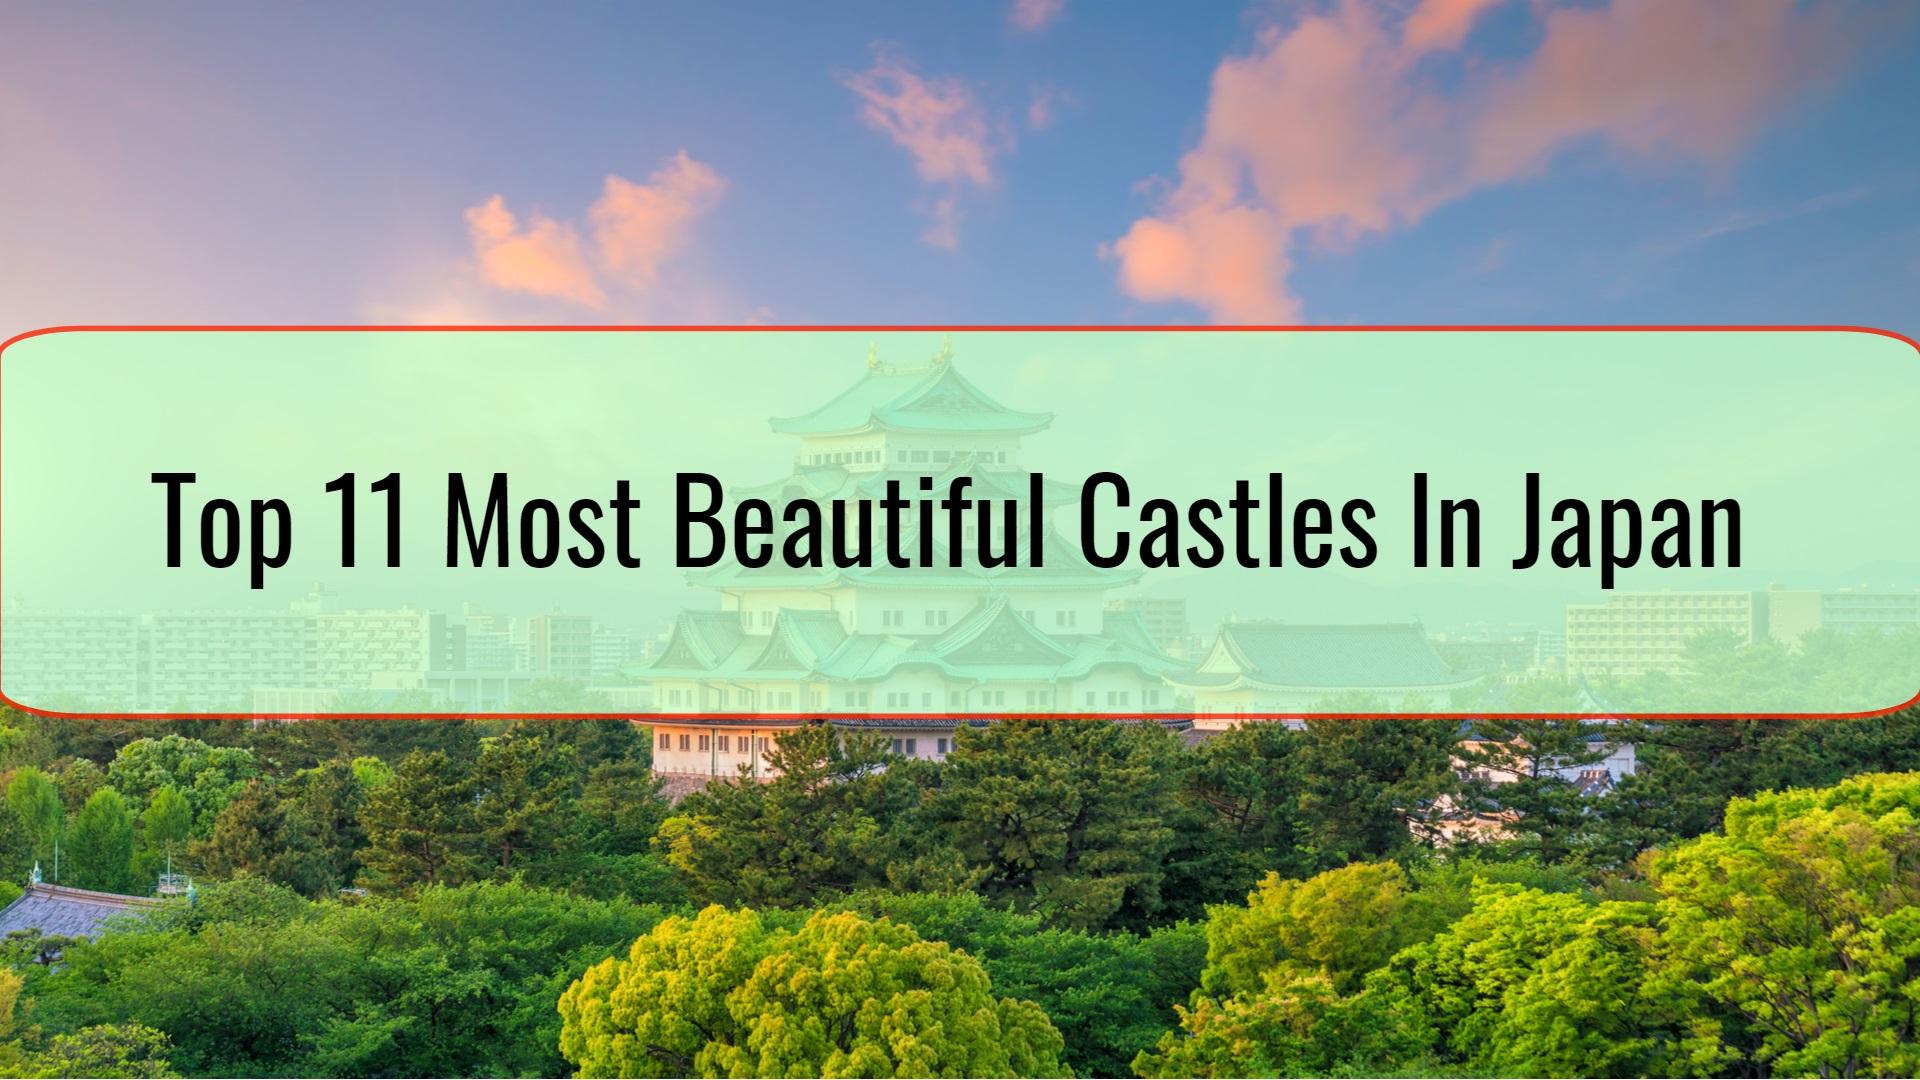 Top 11 Most Beautiful Castles In Japan